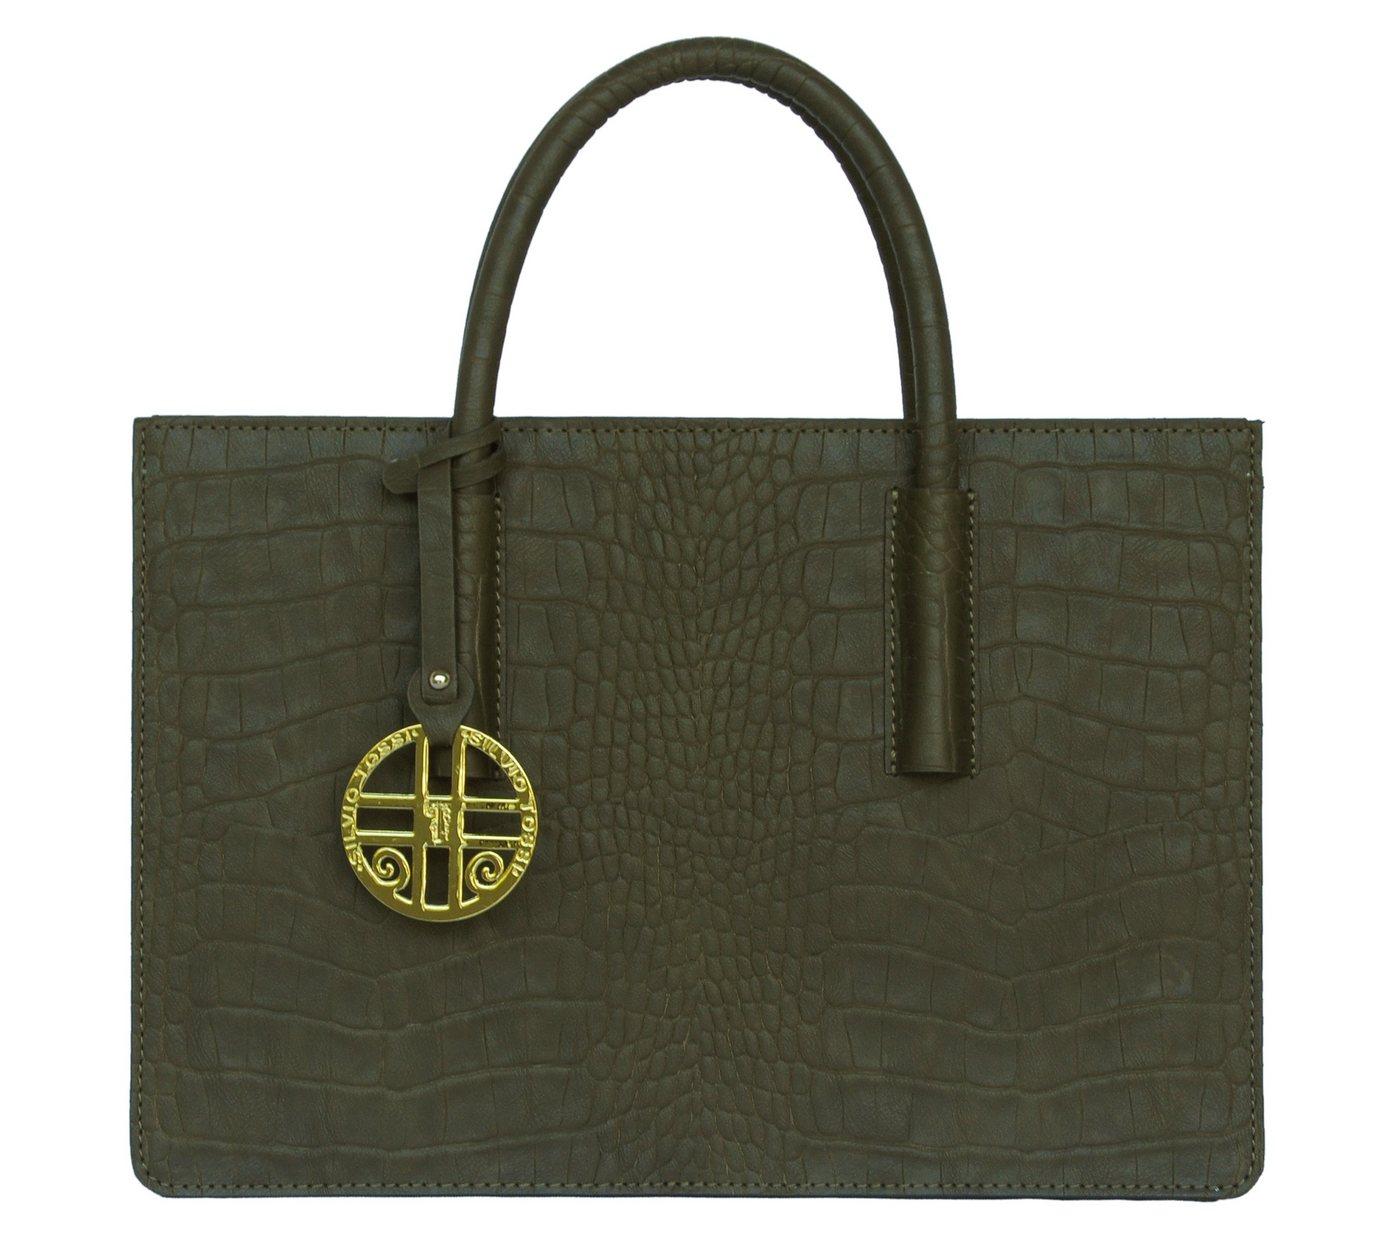 Silvio Tossi Lederhandtasche mit Spezialschutzschicht | Taschen > Handtaschen > Ledertaschen | Grün | Silvio Tossi